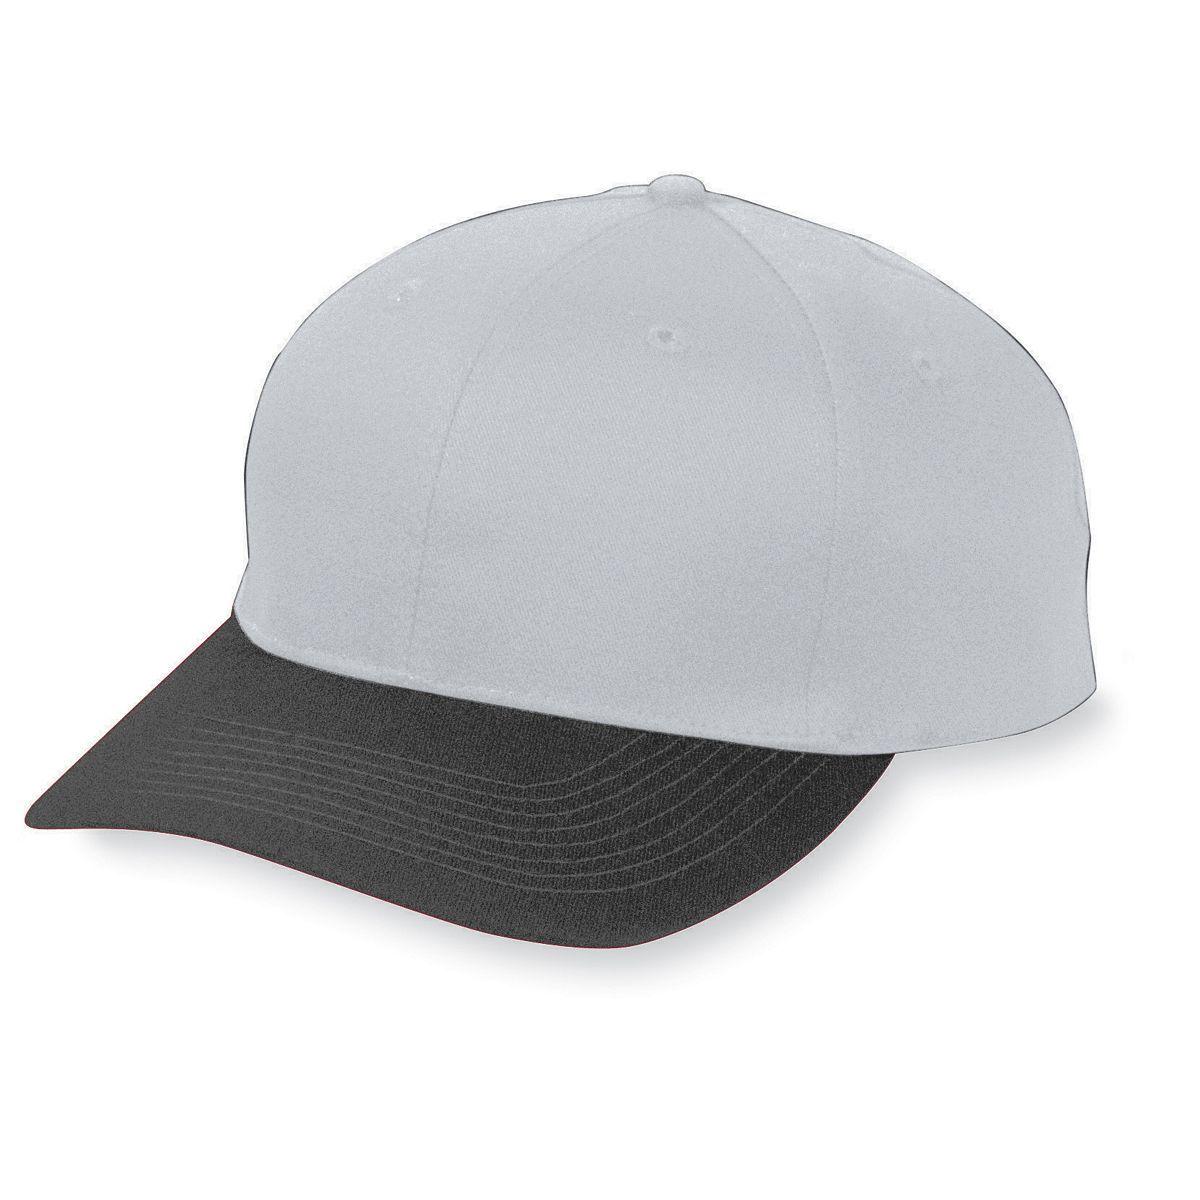 Six-Panel Cotton Twill Low-Profile Cap - SILVER GREY/BLACK